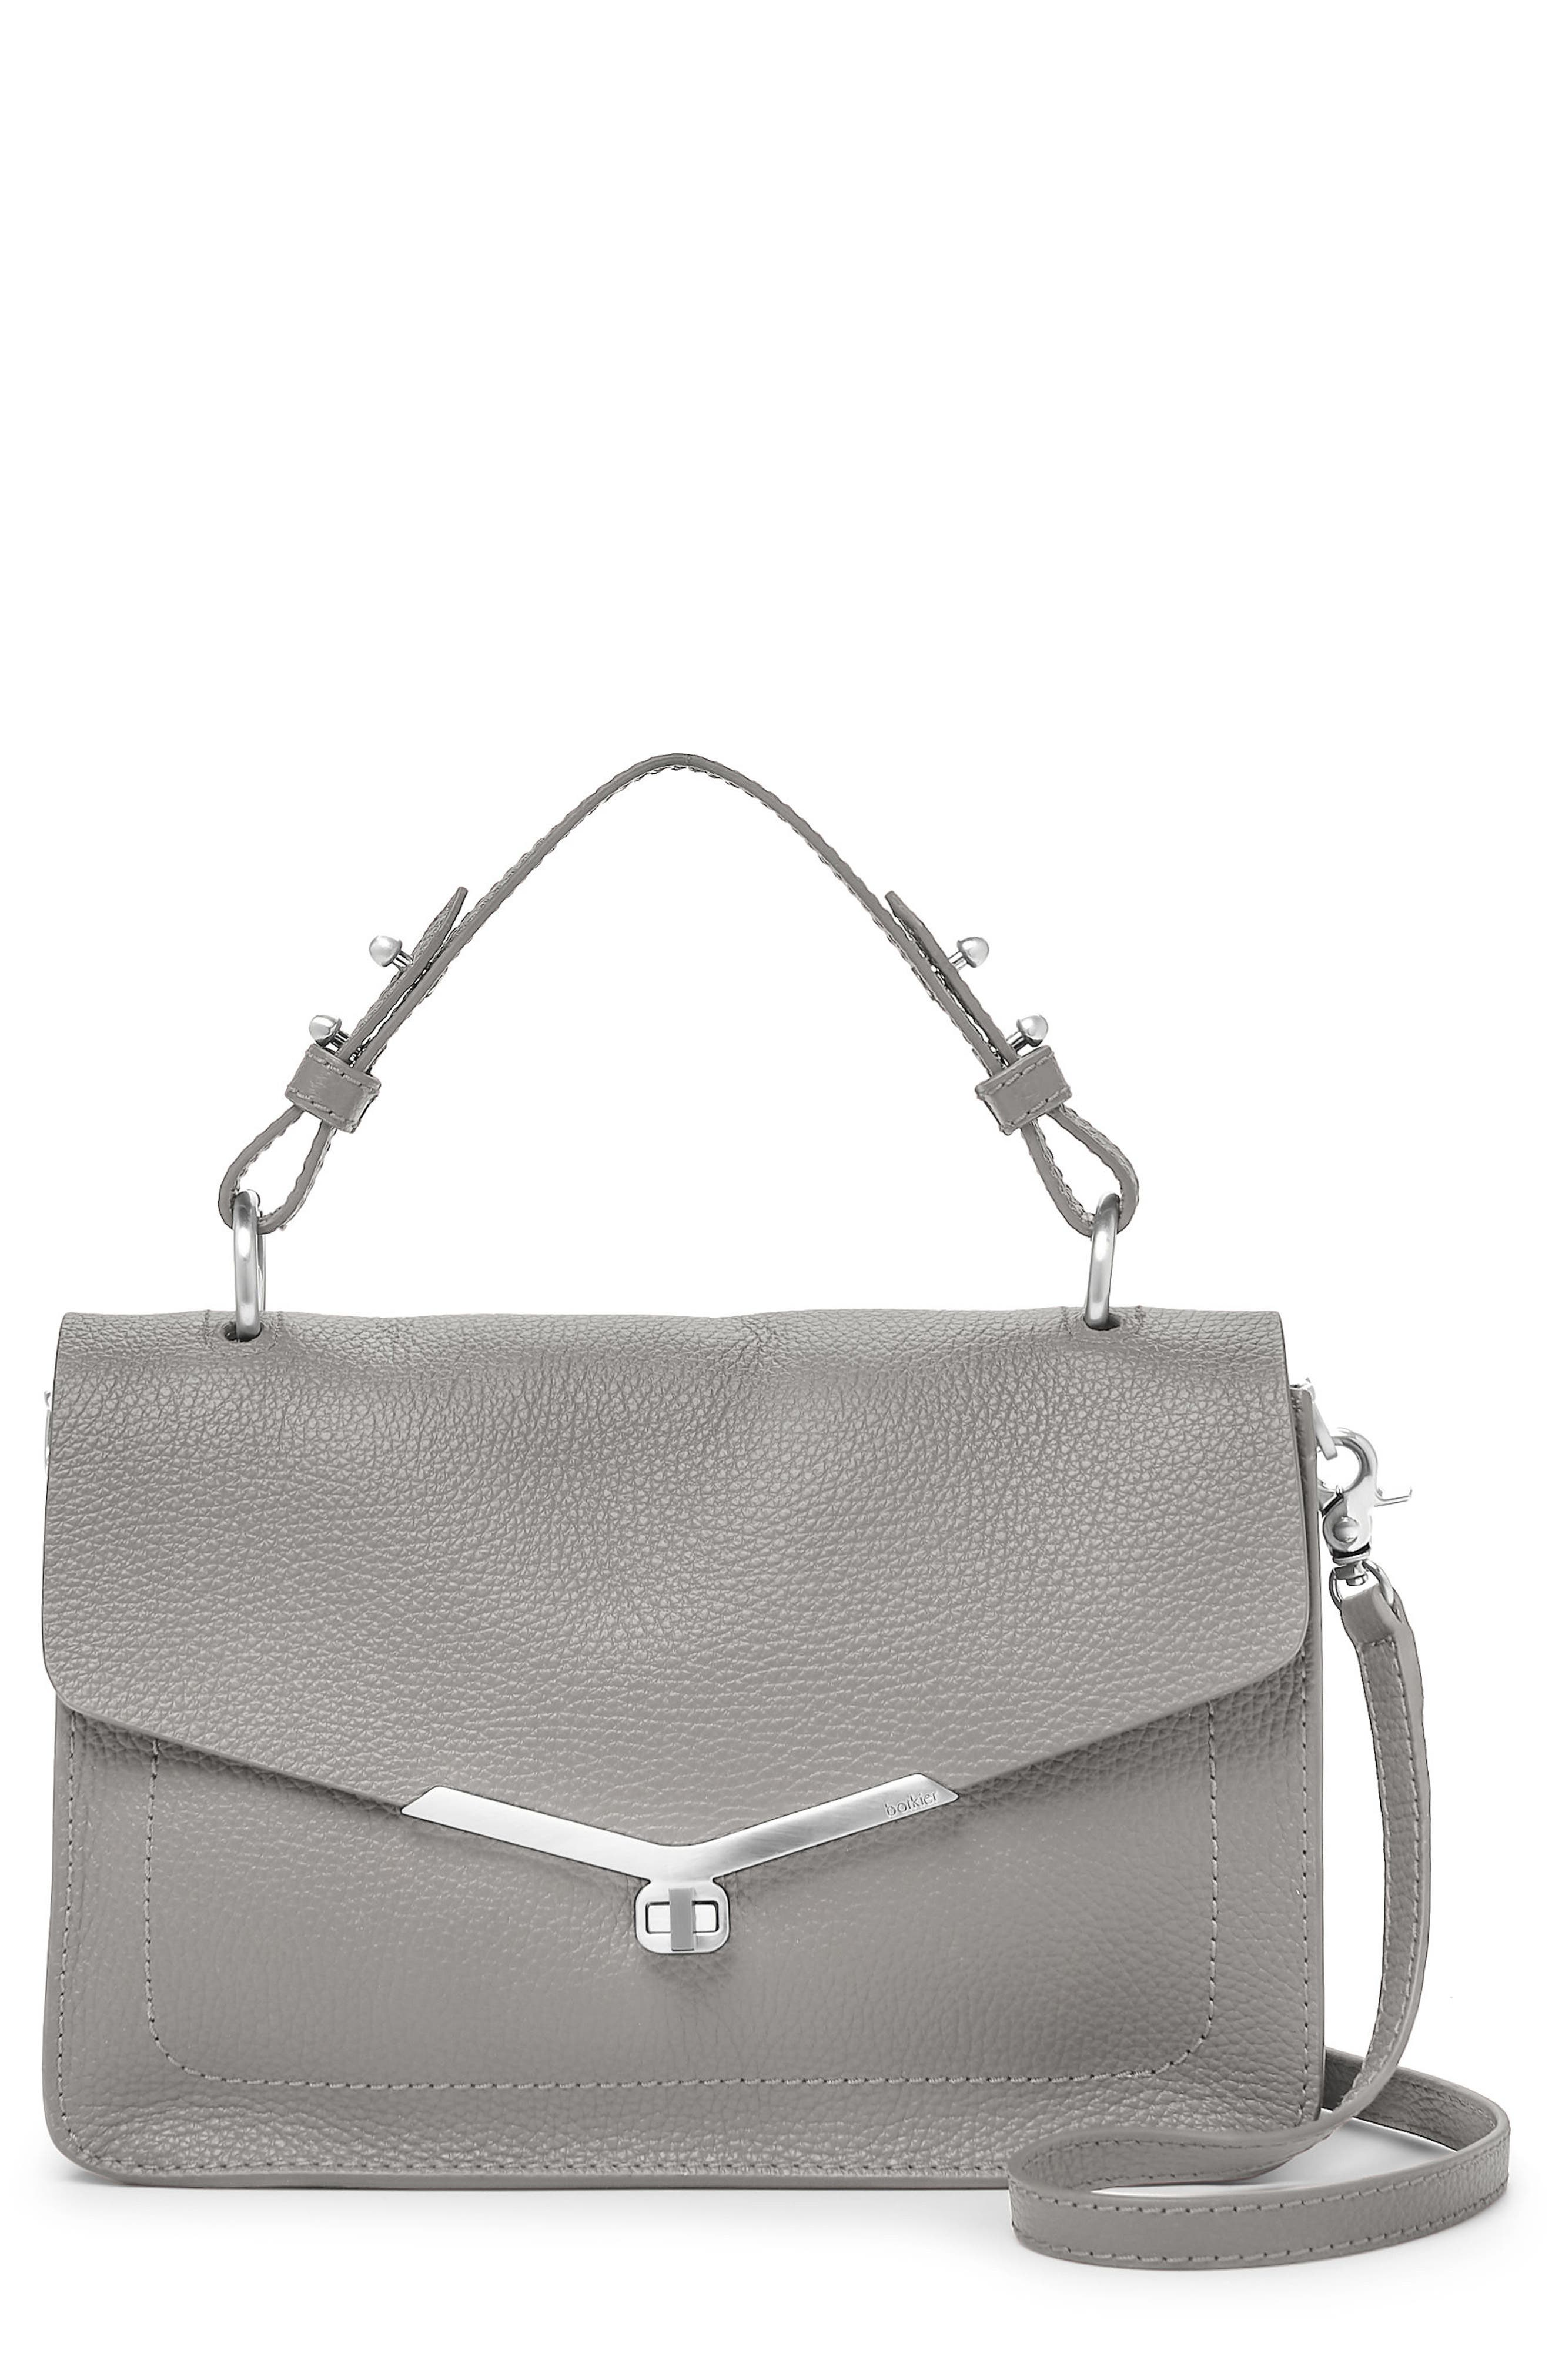 Vivi Calfskin Leather Satchel,                         Main,                         color, Grey